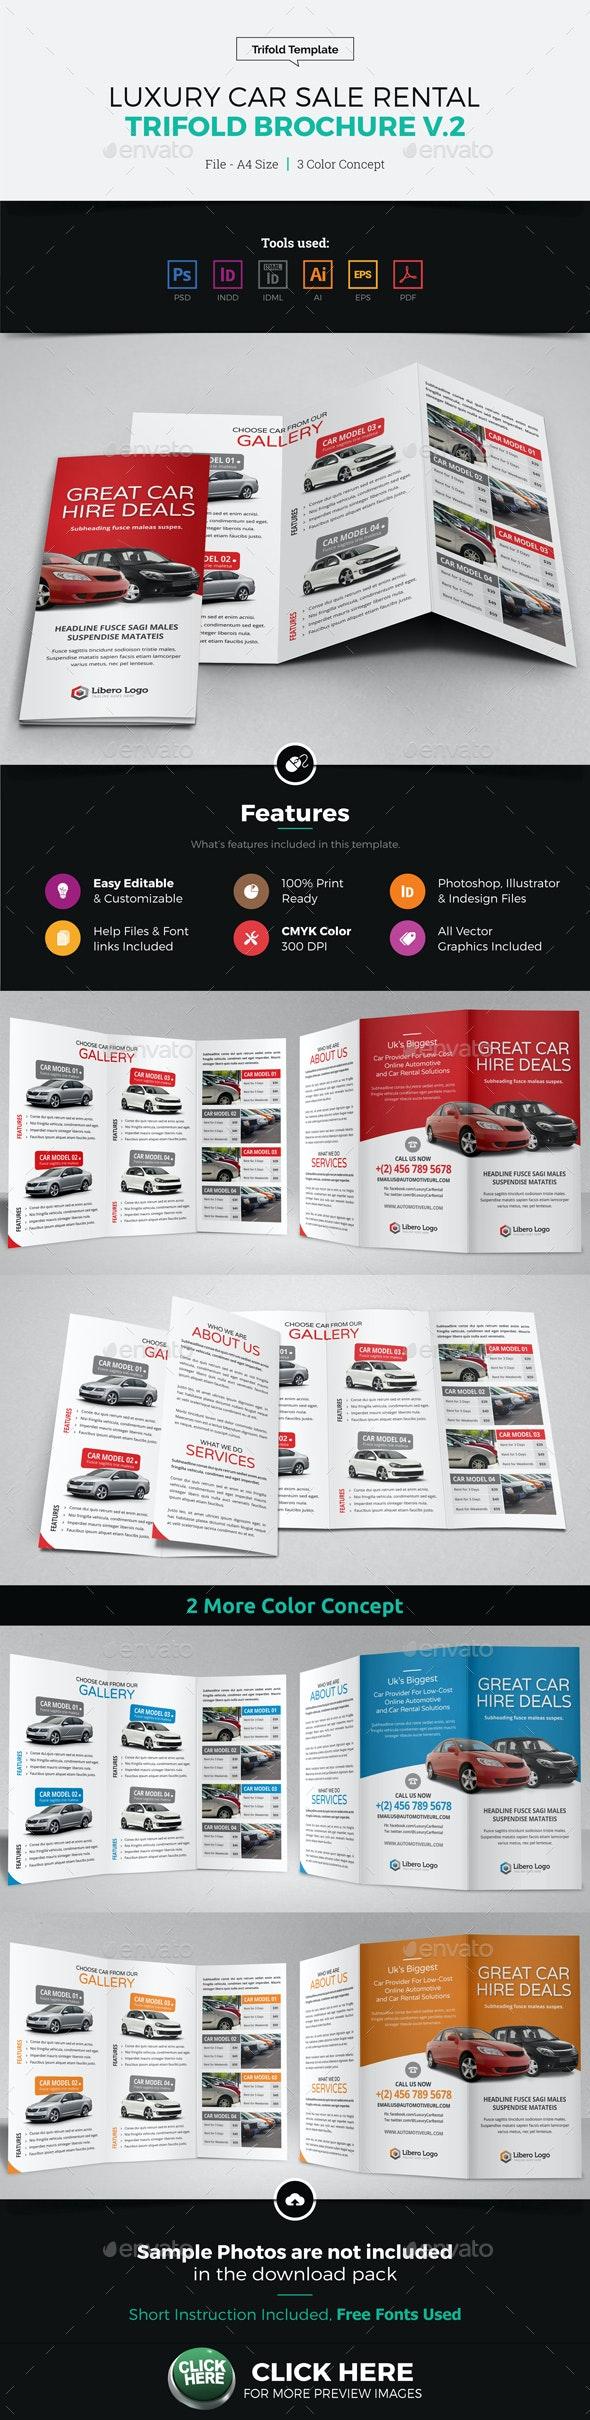 Luxury Car Sale Rental Trifold Brochure v2 - Corporate Brochures